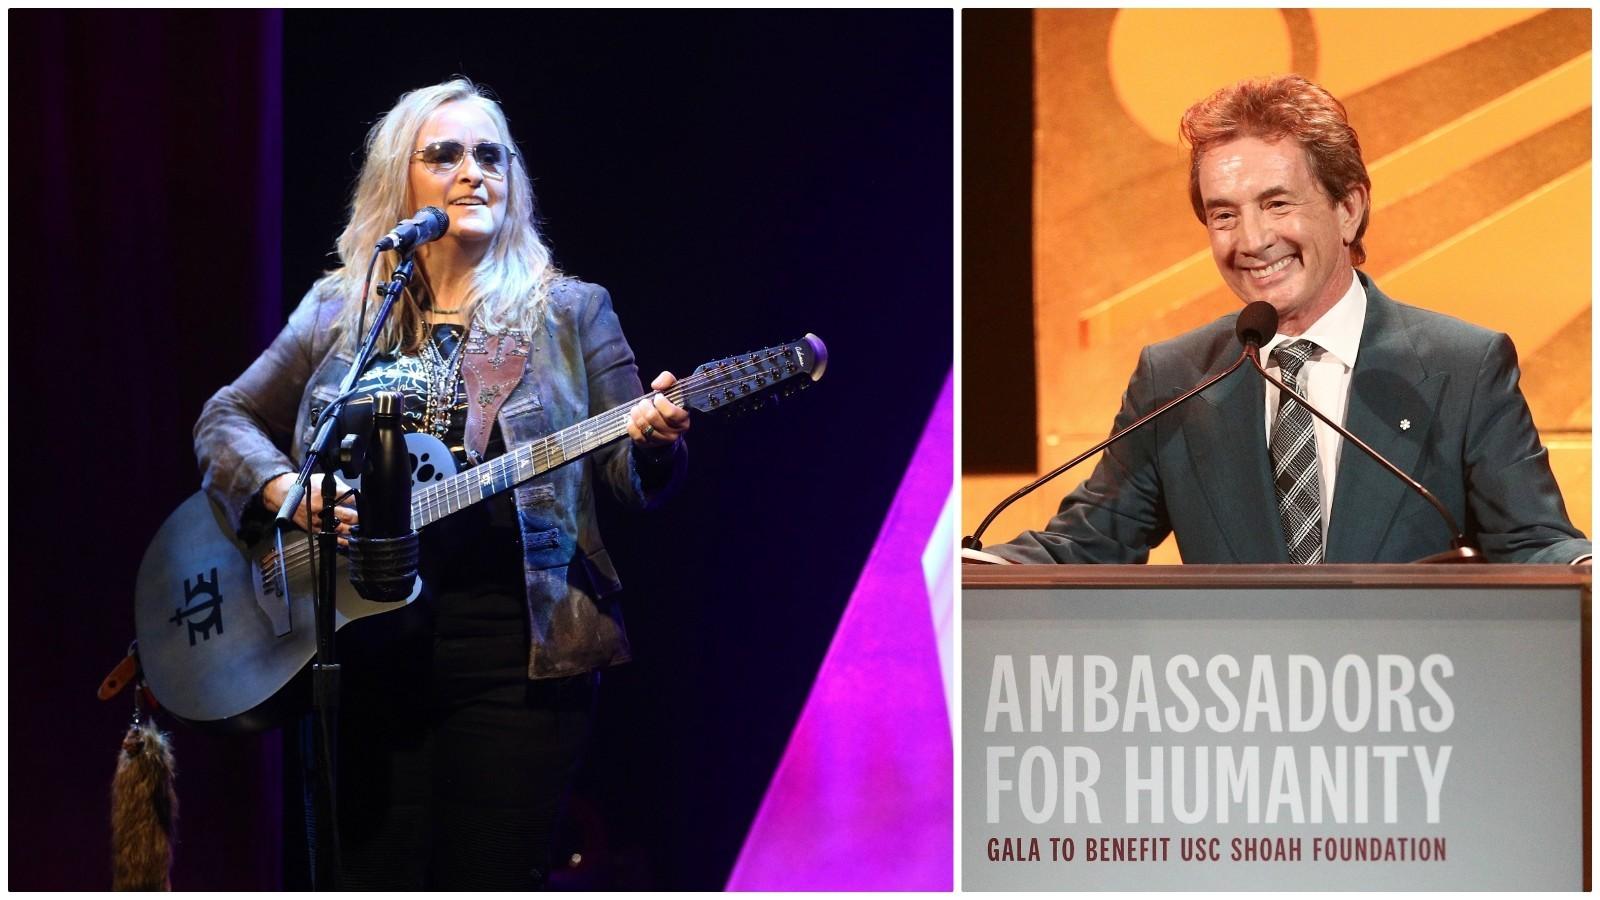 Ambassadors for Humanity gala